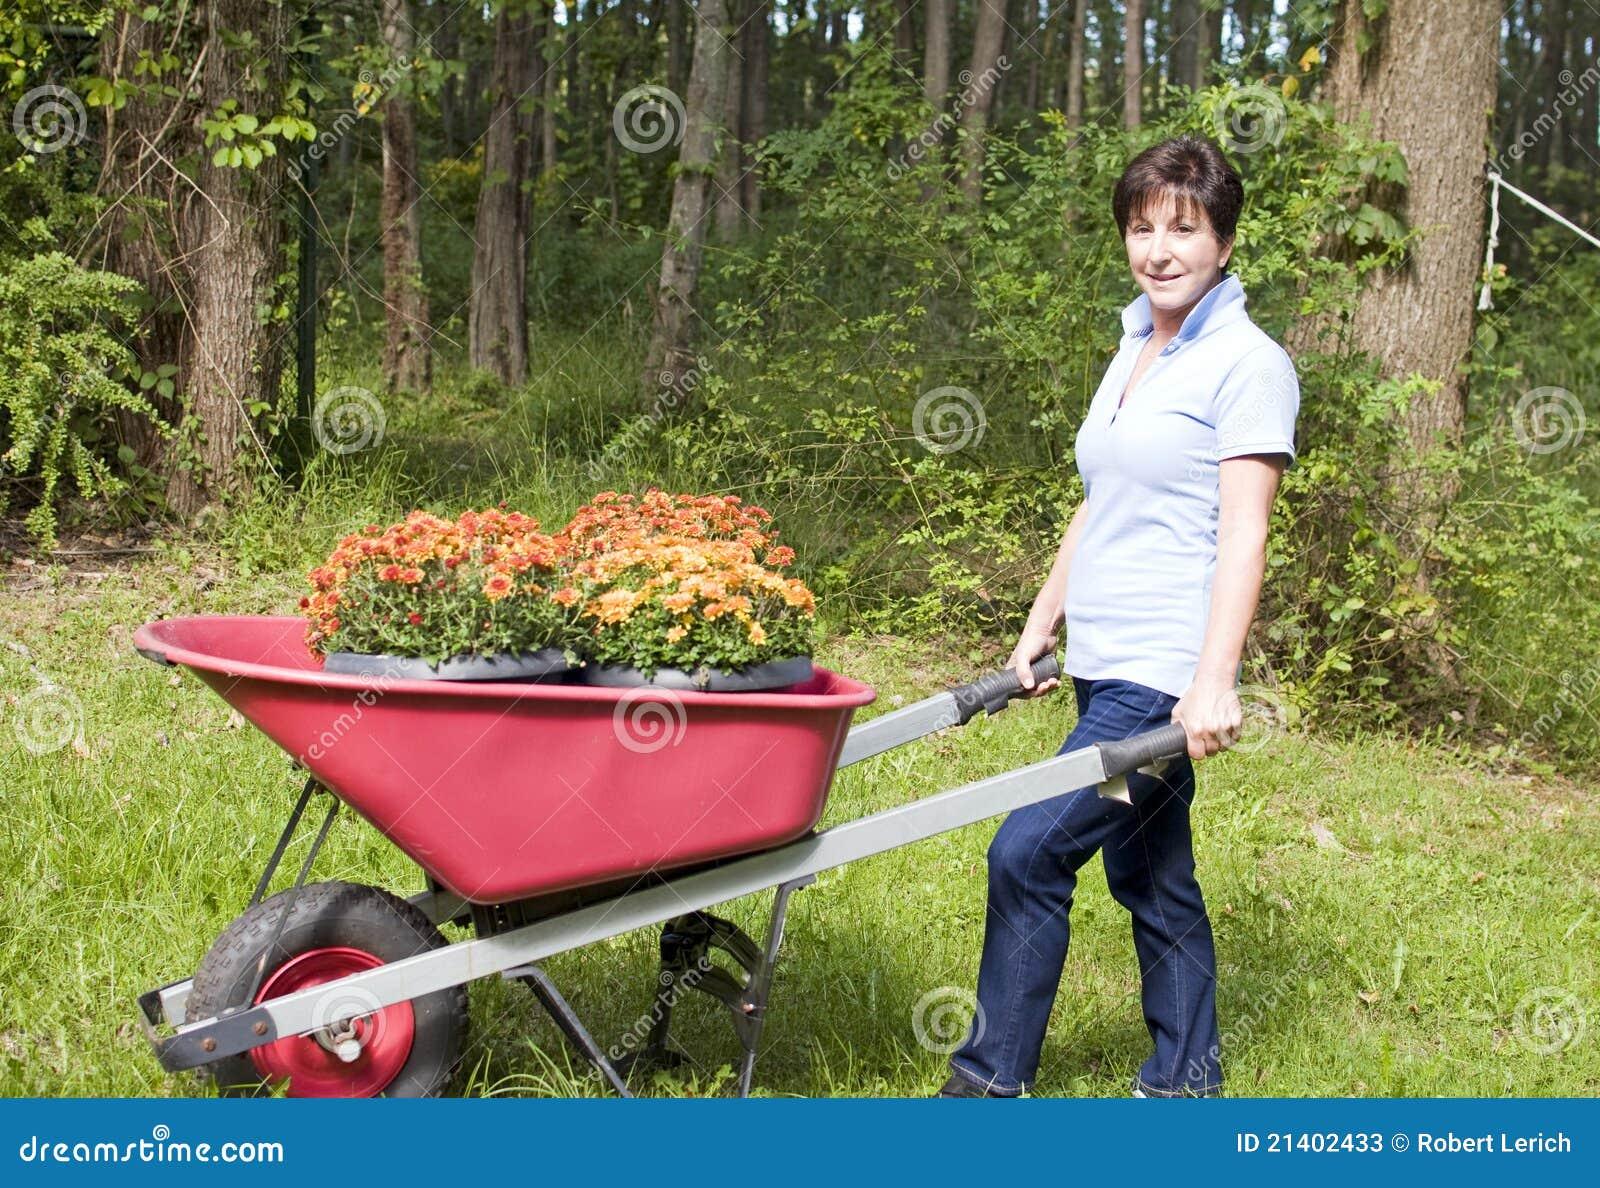 Radeberchrysanthemen der frau im garten arbeiten stockbild for Garten arbeiten